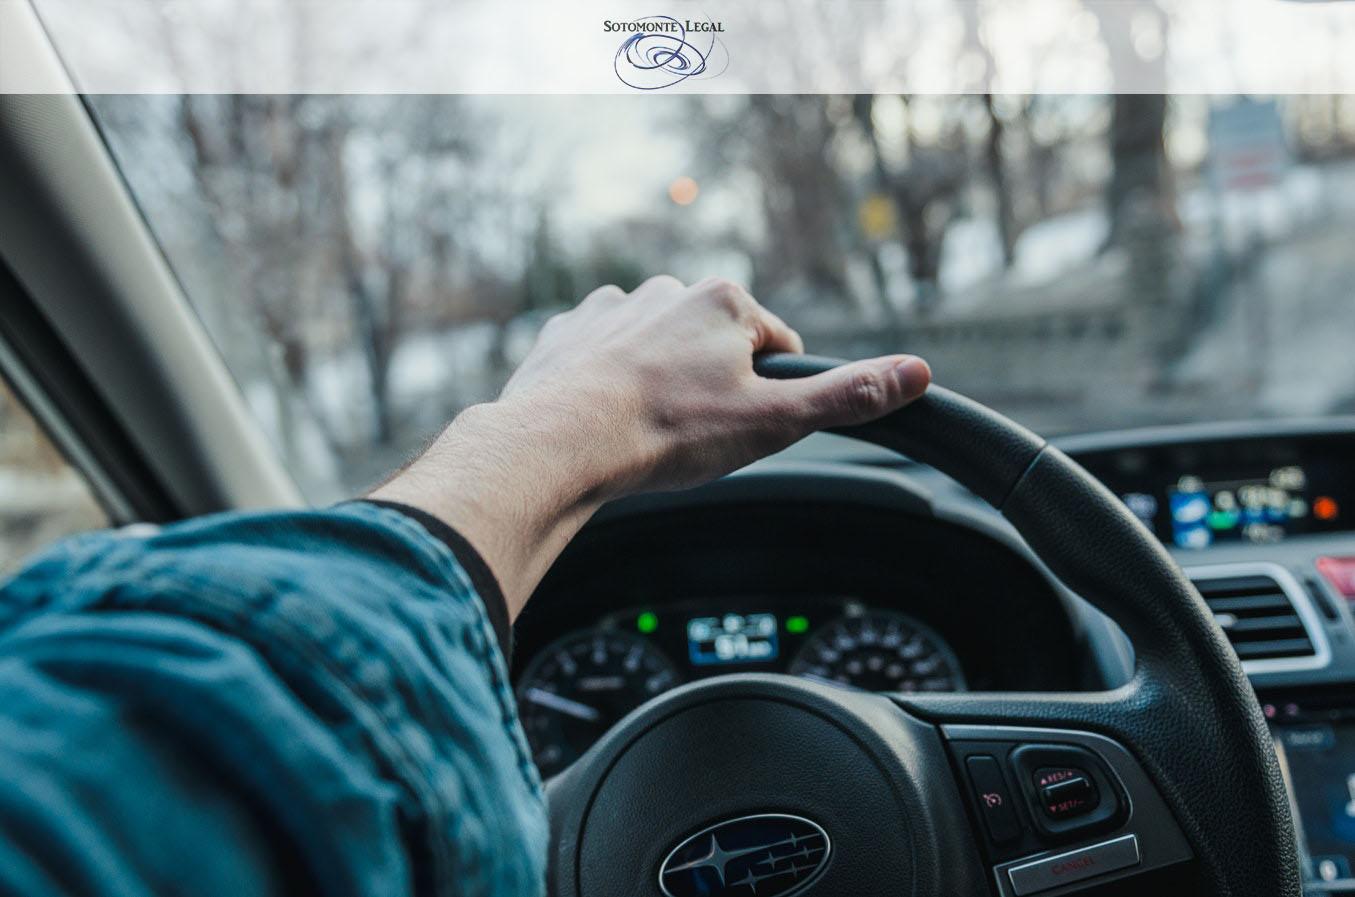 Indemnización por accidente de tráfico: Sistema de valoración